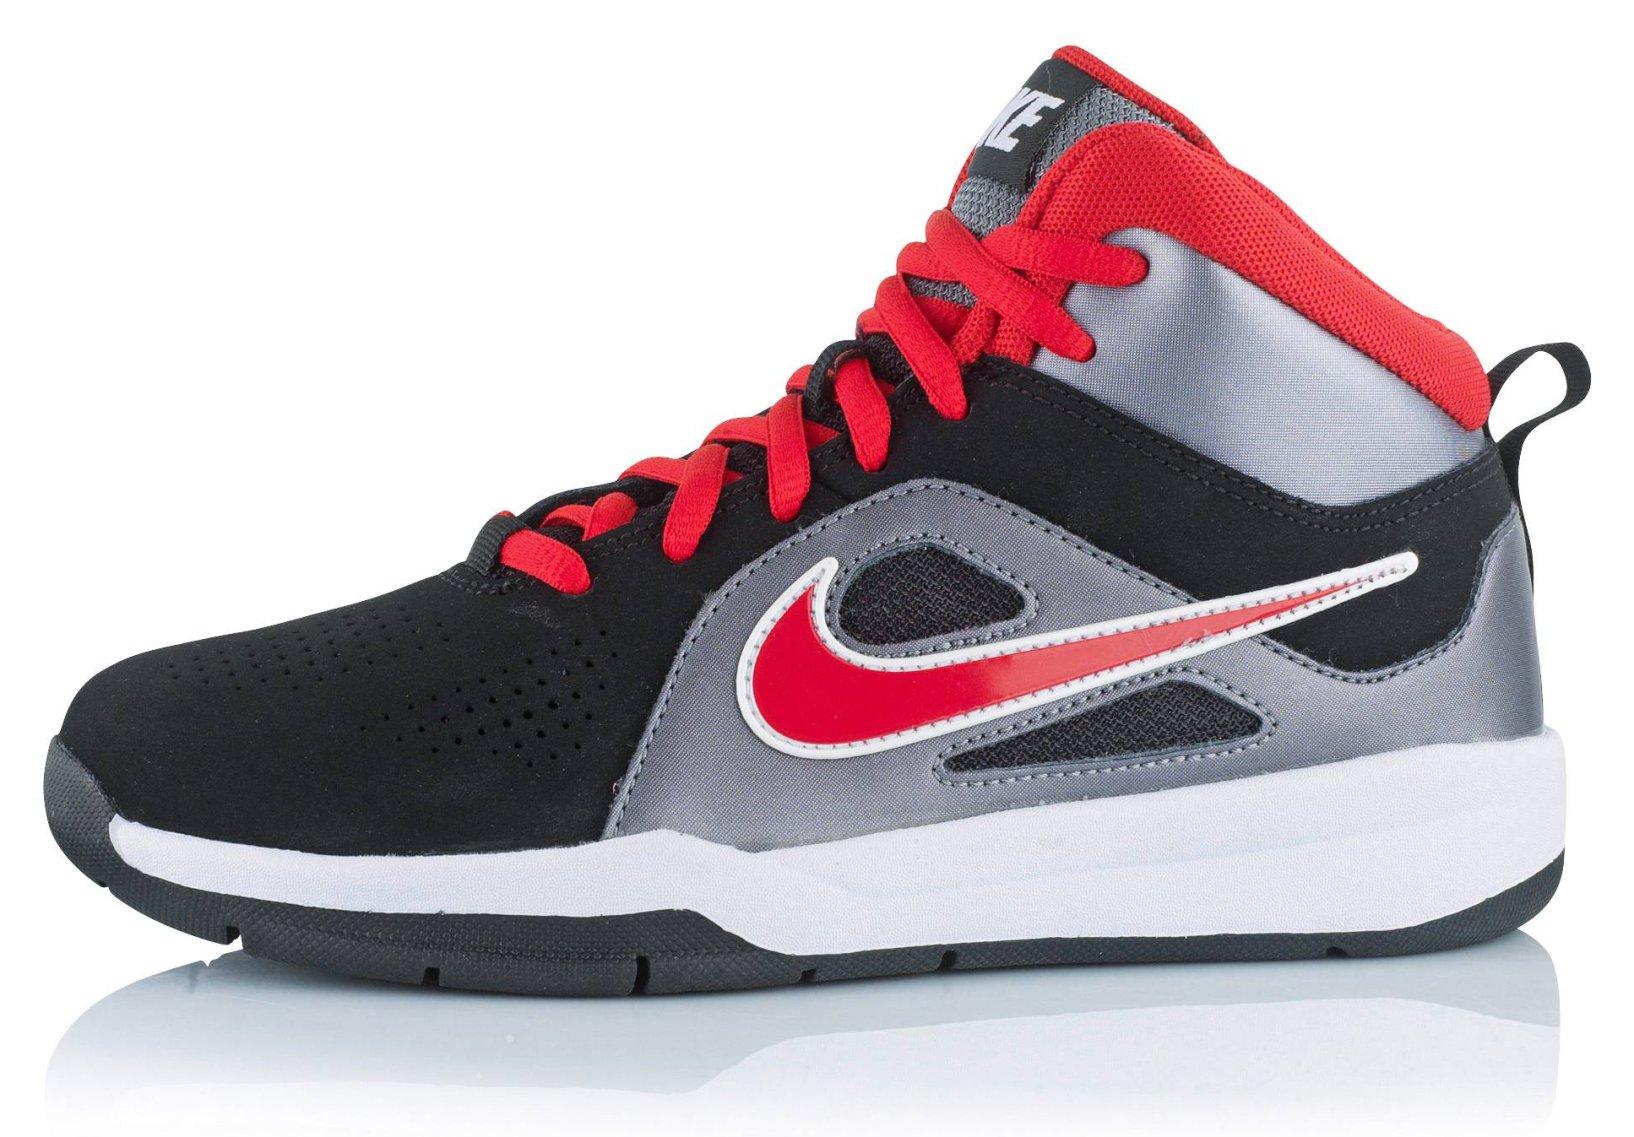 d1214b3ac44b21 de geneve redskins de basket basket chaussure chaussure chaussure vqE76